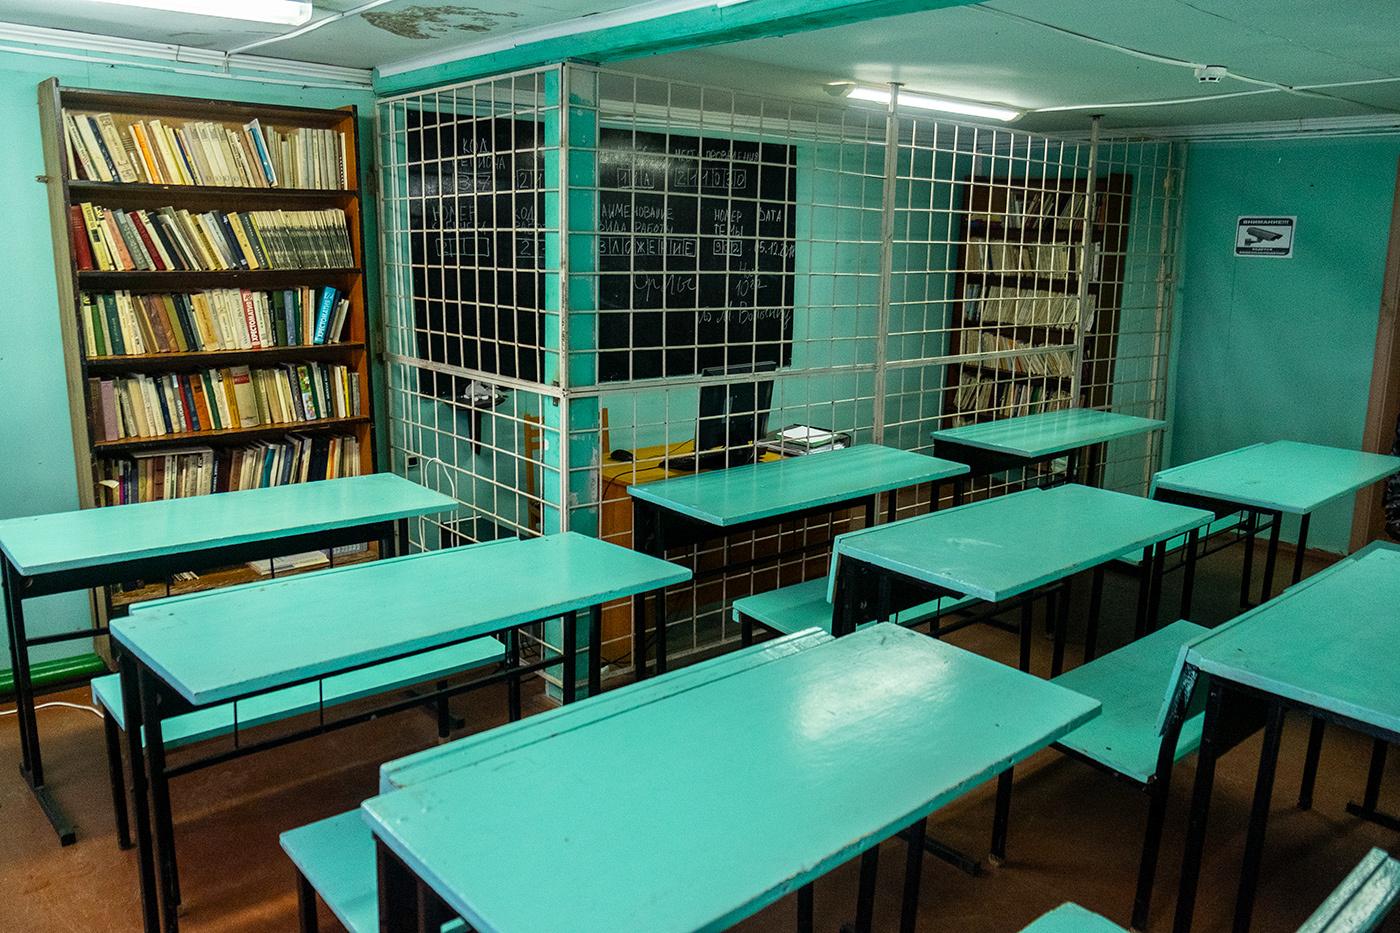 Библиотека колонии строгого режима №4, Кинешма.